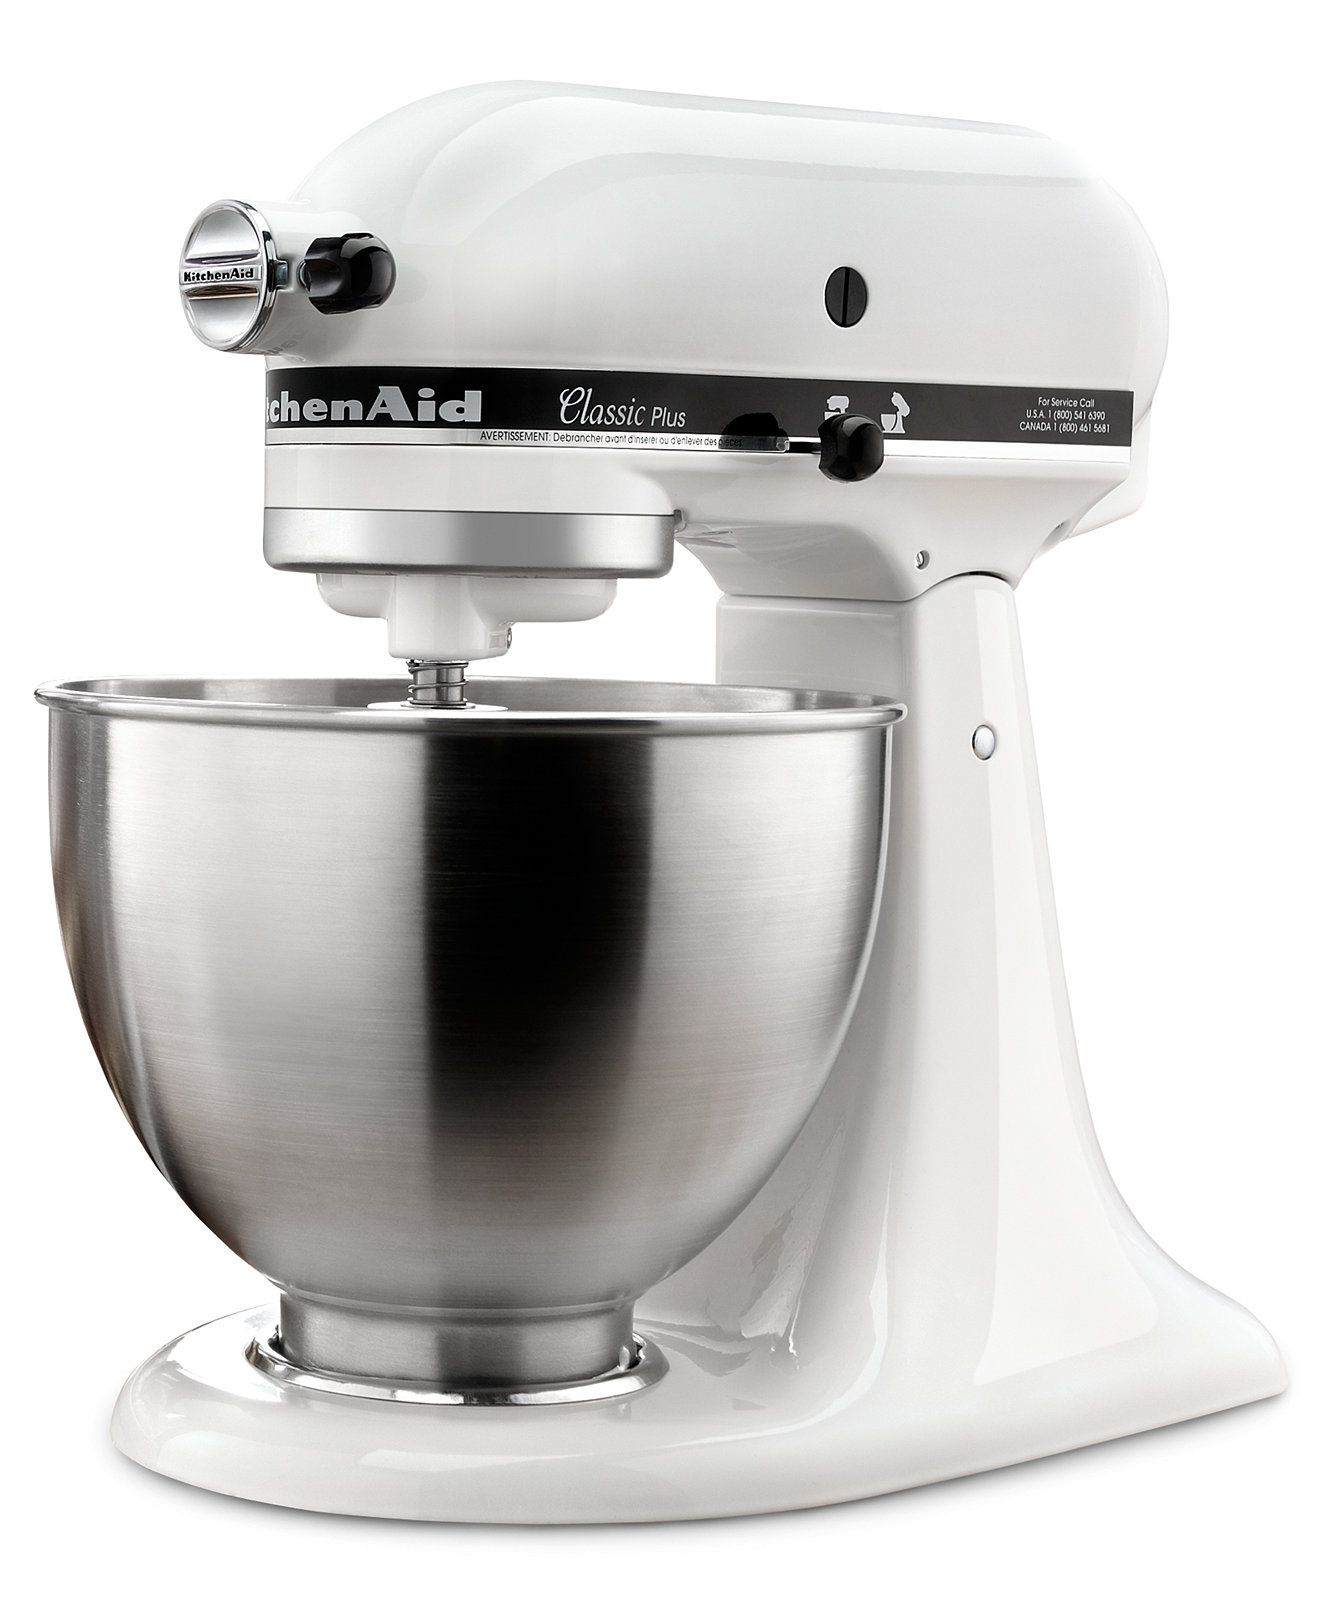 KitchenAid KSM75WH Classic Plus 4.5-Quart Tilt Head Stand Mixer - Electrics - Kitchen - Macy's